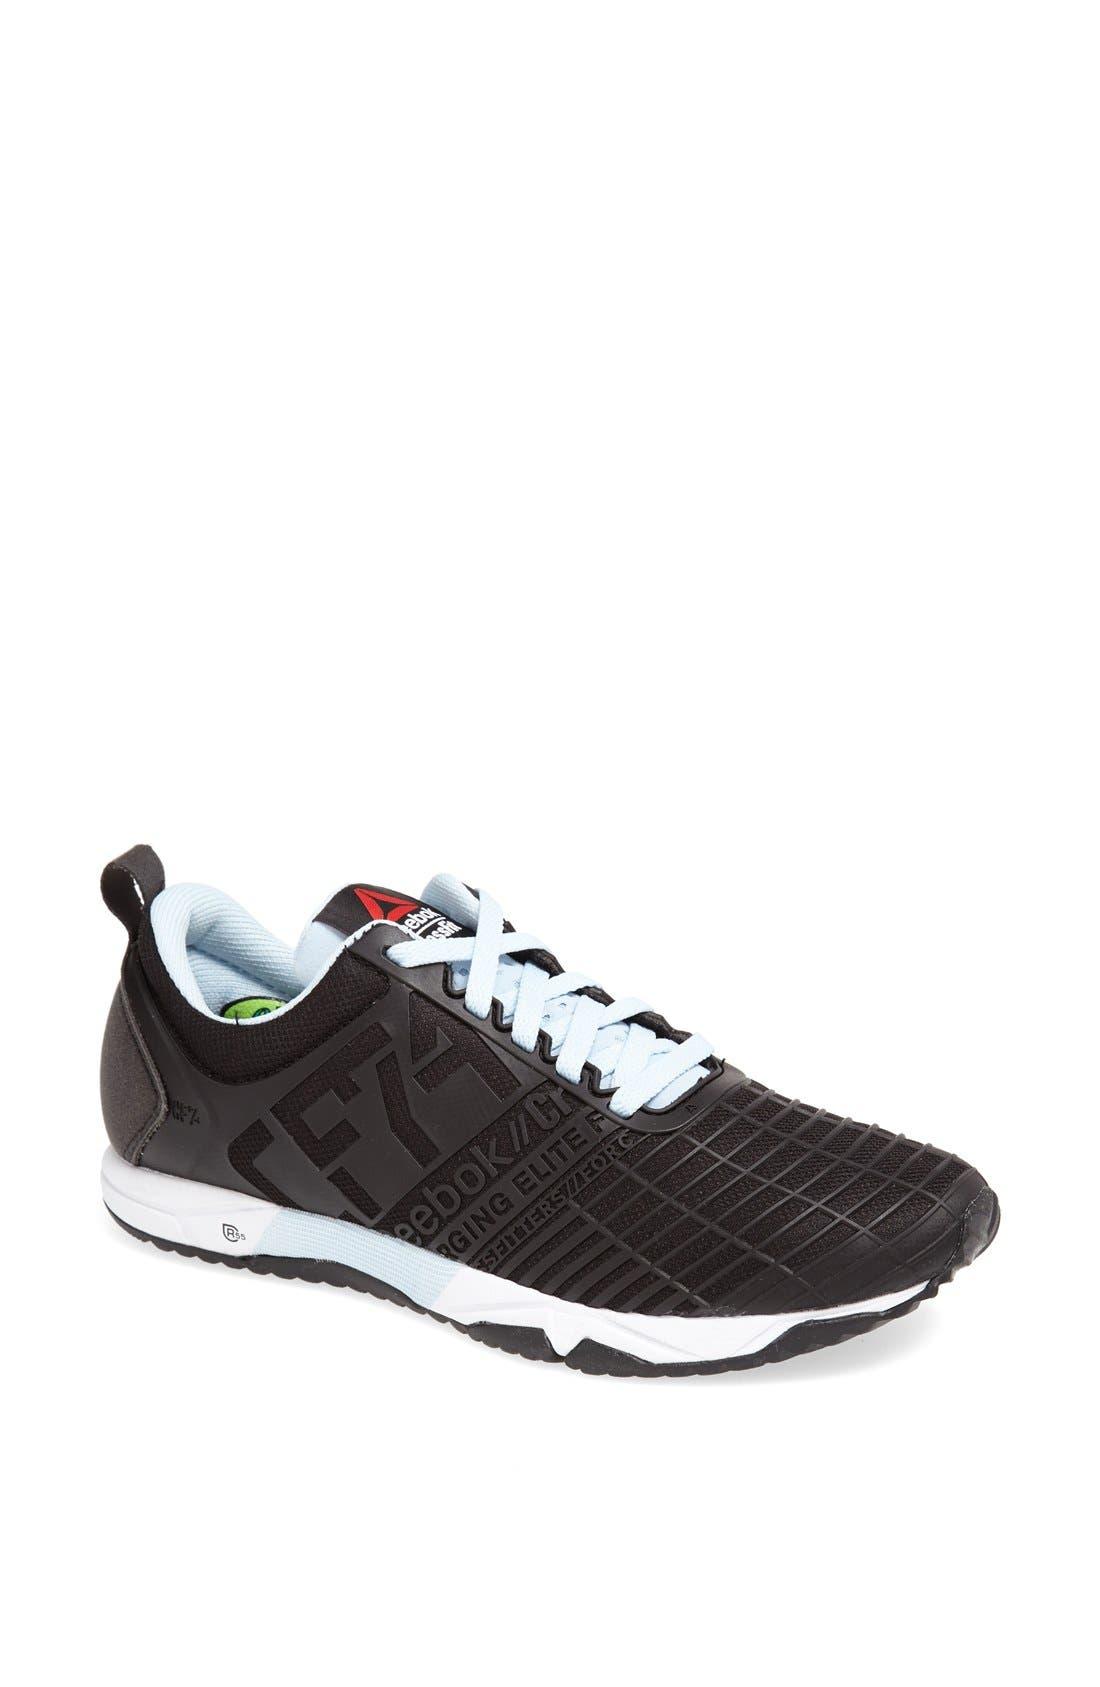 Alternate Image 1 Selected - Reebok 'Crossfit Sprint' Training Shoe (Women)